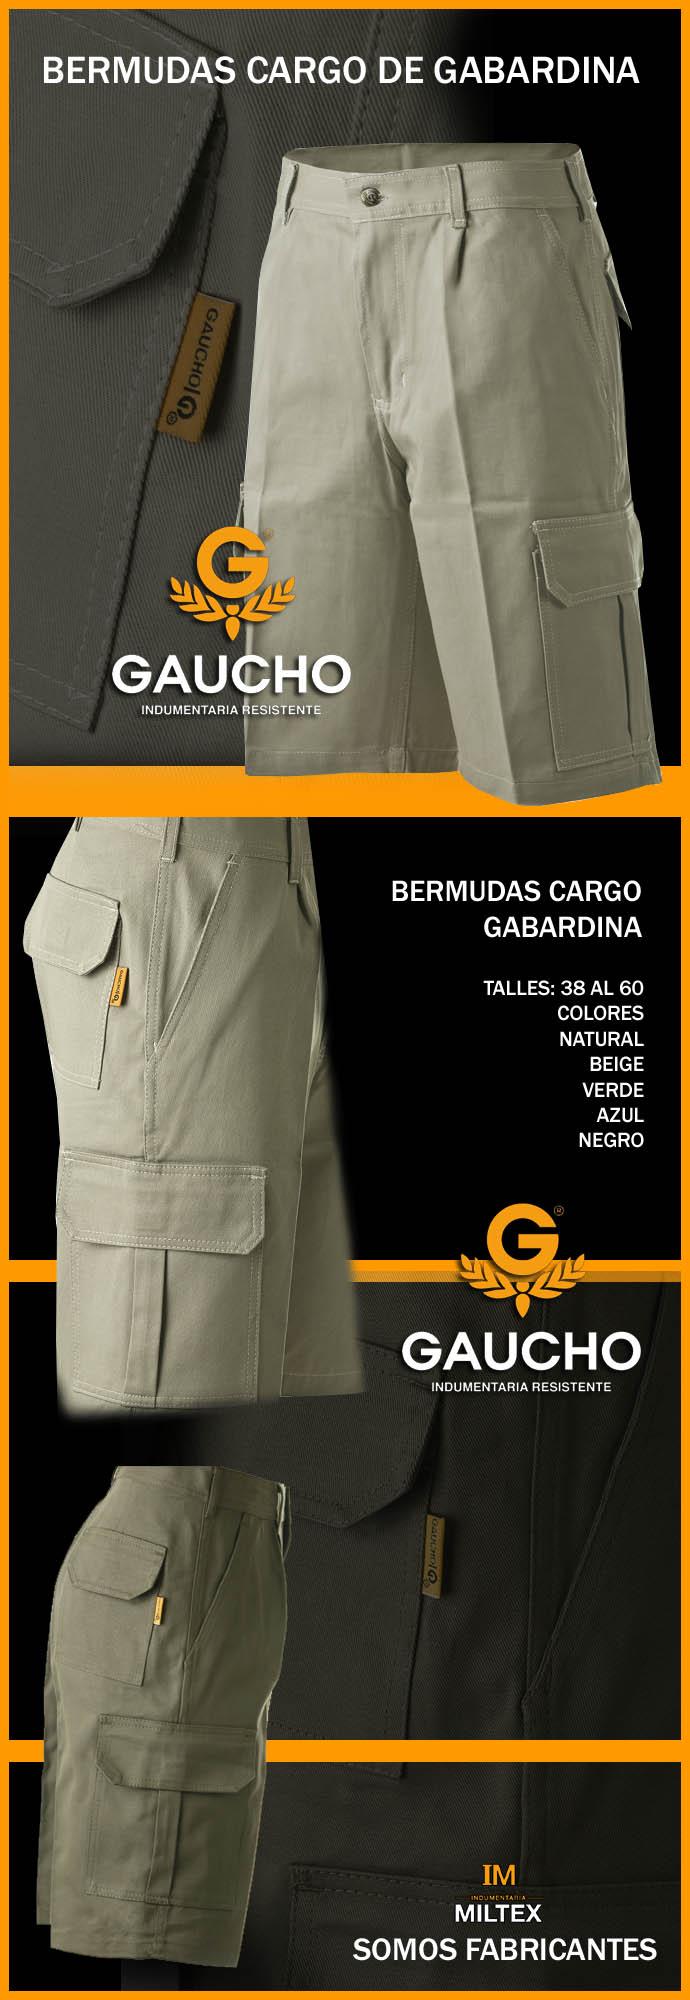 Bermudas Cargo Gabardina